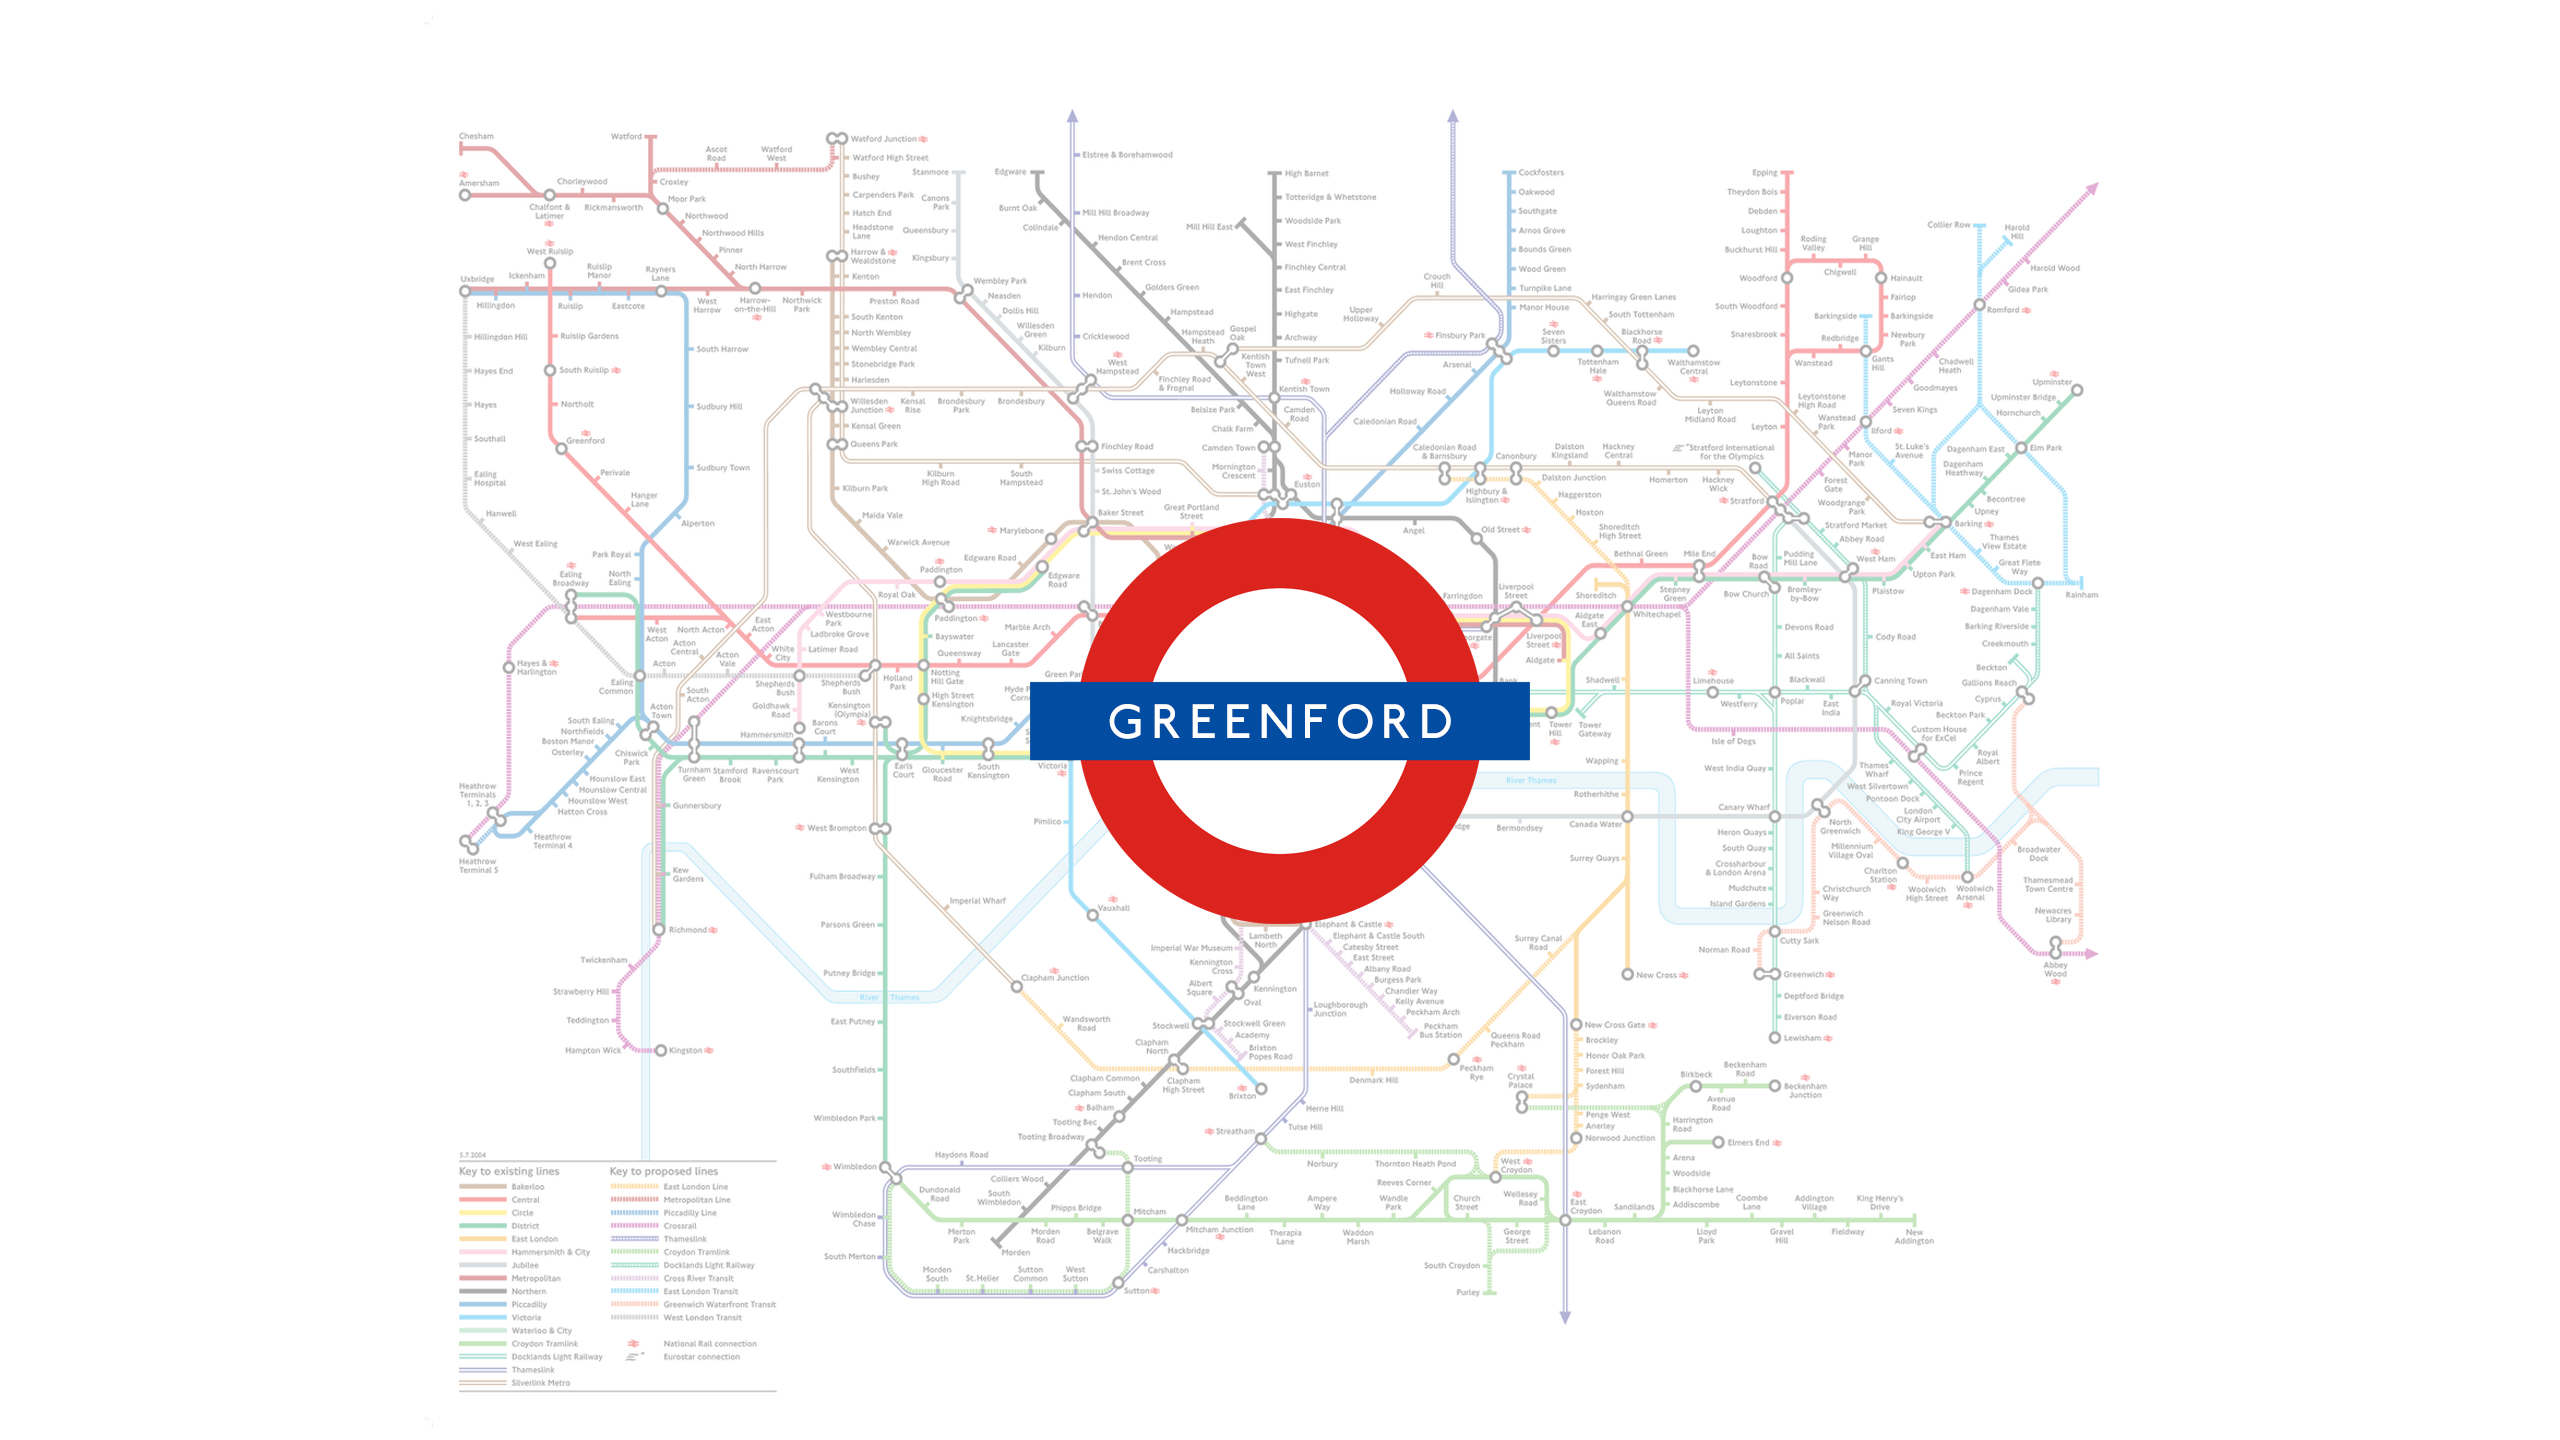 Greenford (Map)